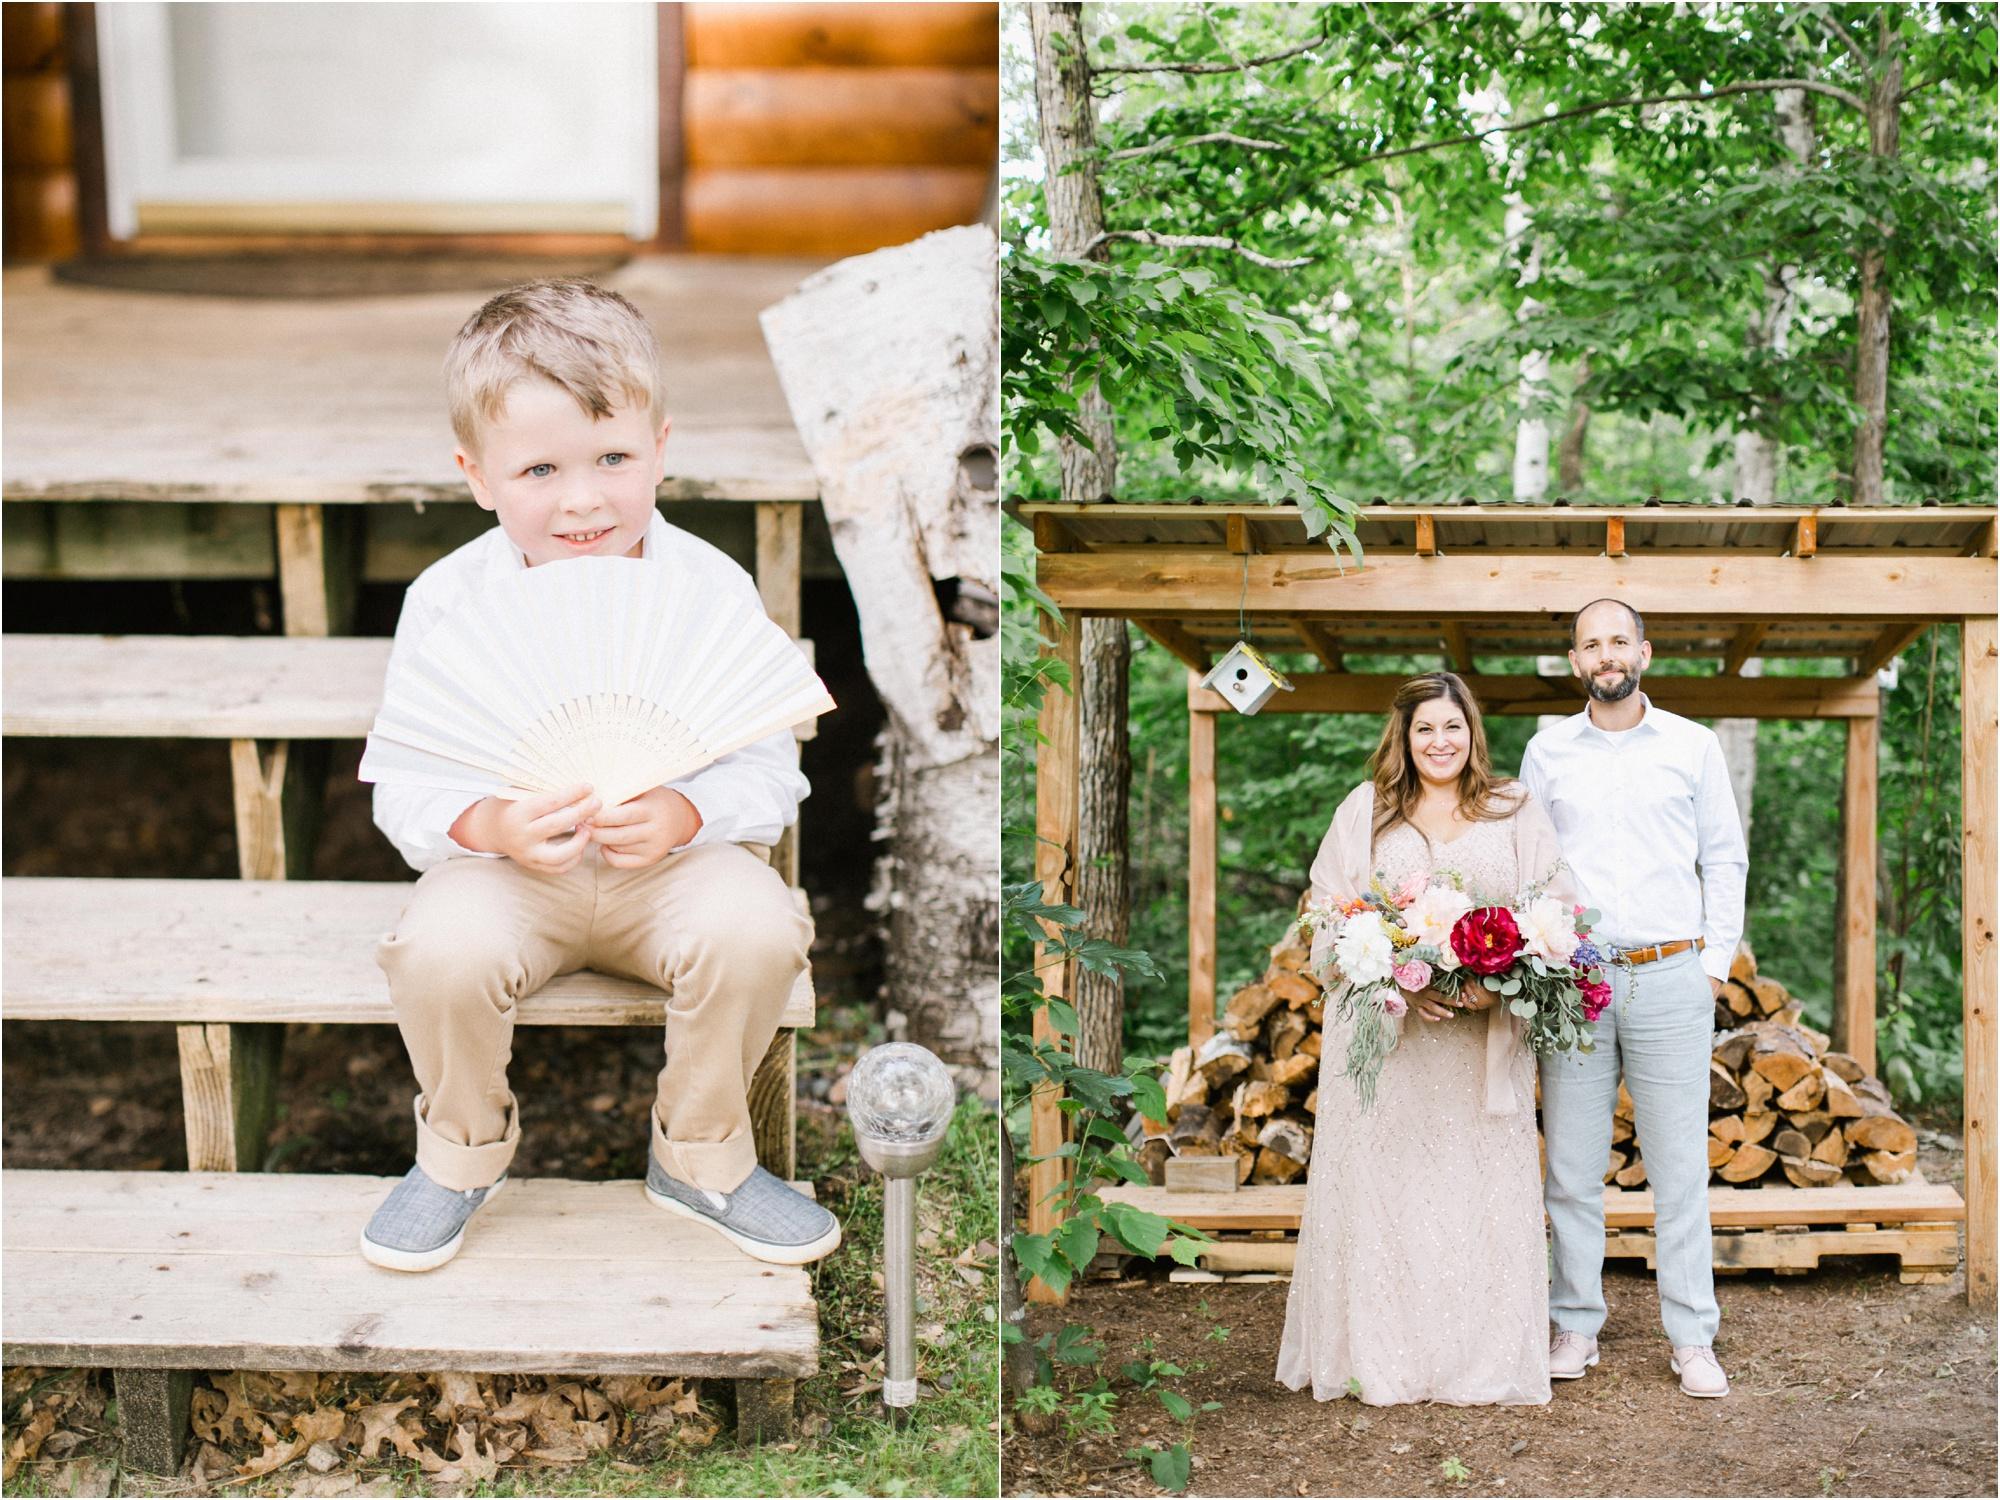 Wedding Photography Brainerd MN Aimee Jobe Photography Private Lake Residence Bloom Designs_0098.jpg